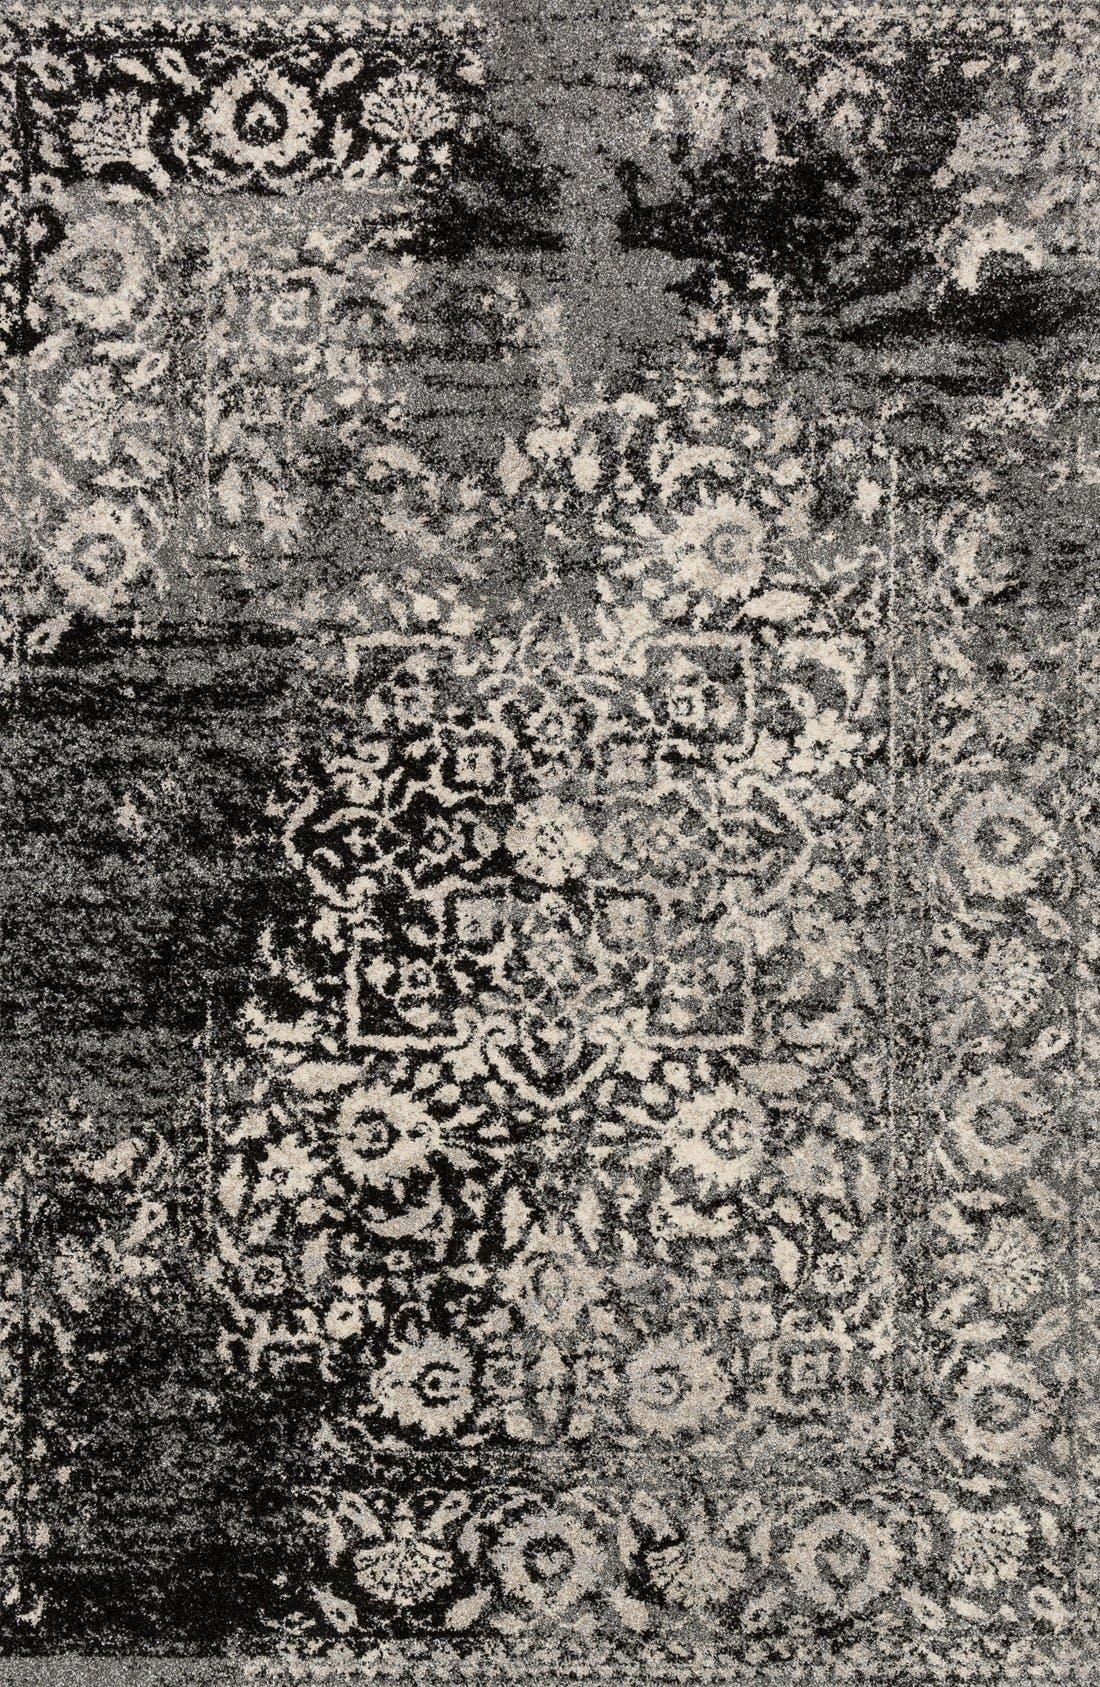 Alternate Image 1 Selected - Loloi 'Emory' Rug